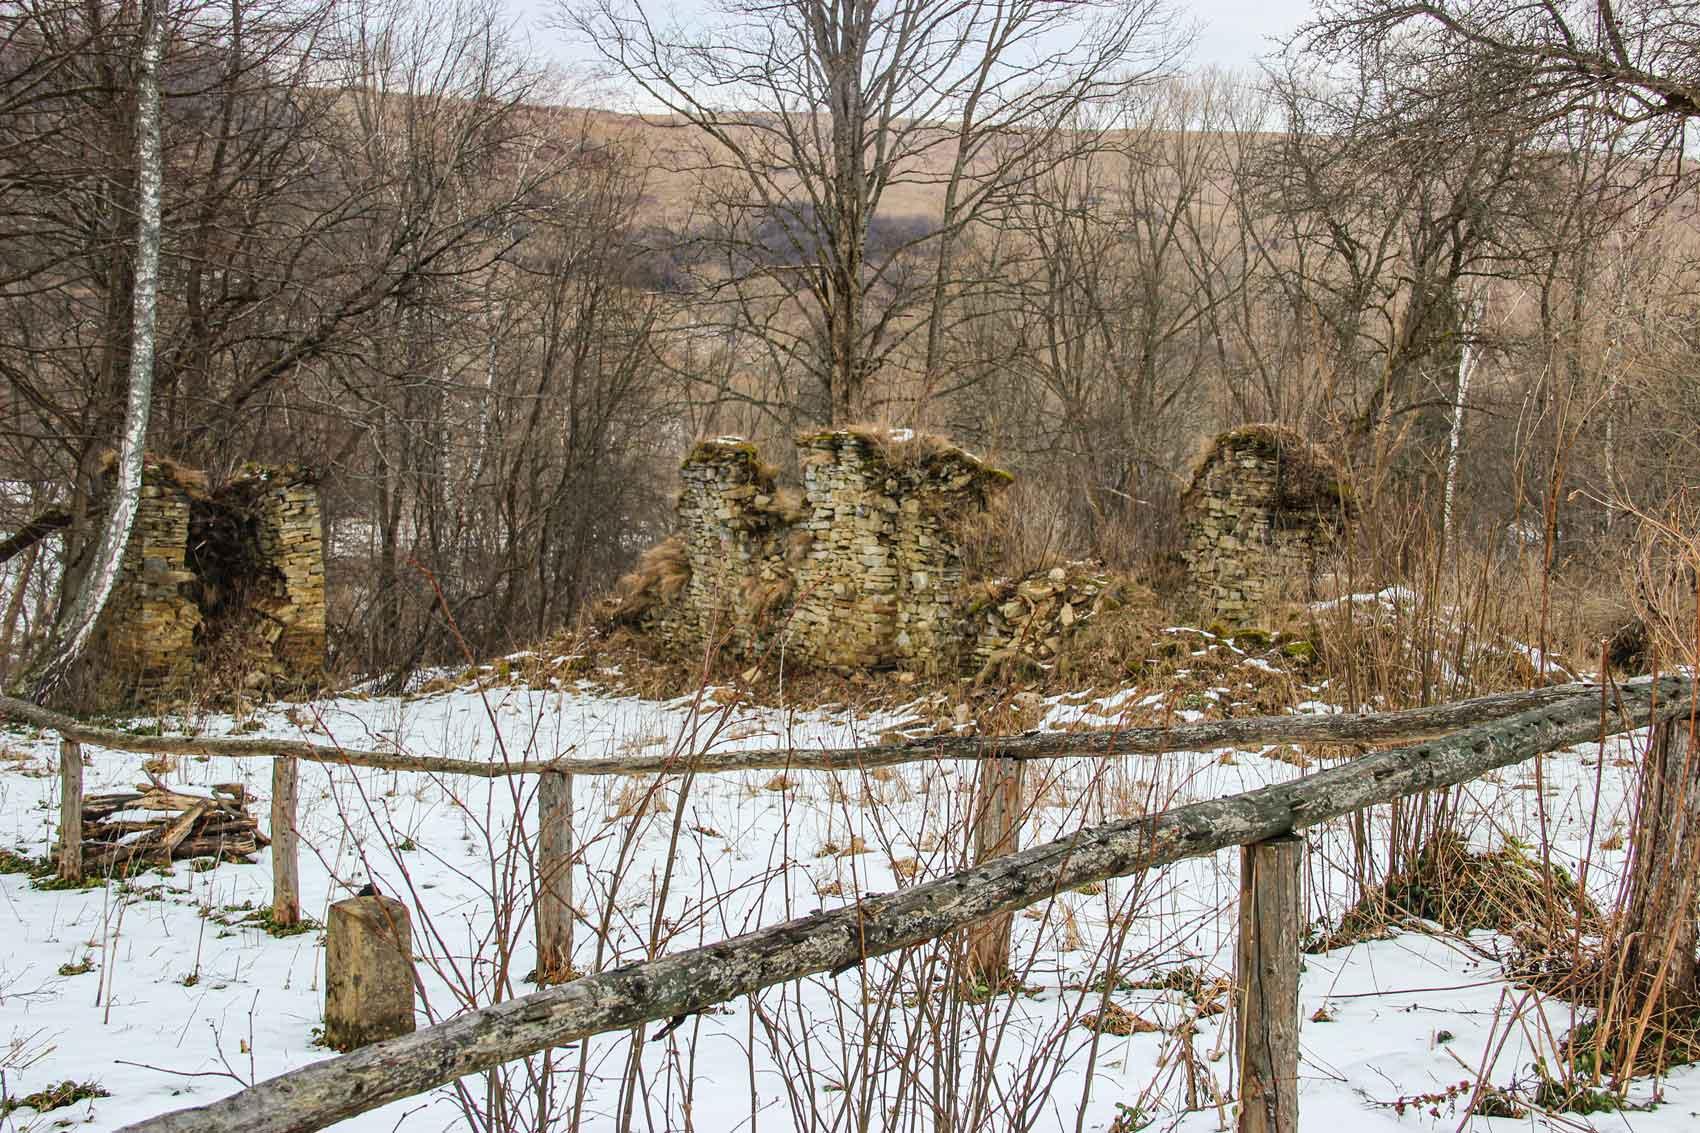 Ruiny Cerkwi w Hulskiem